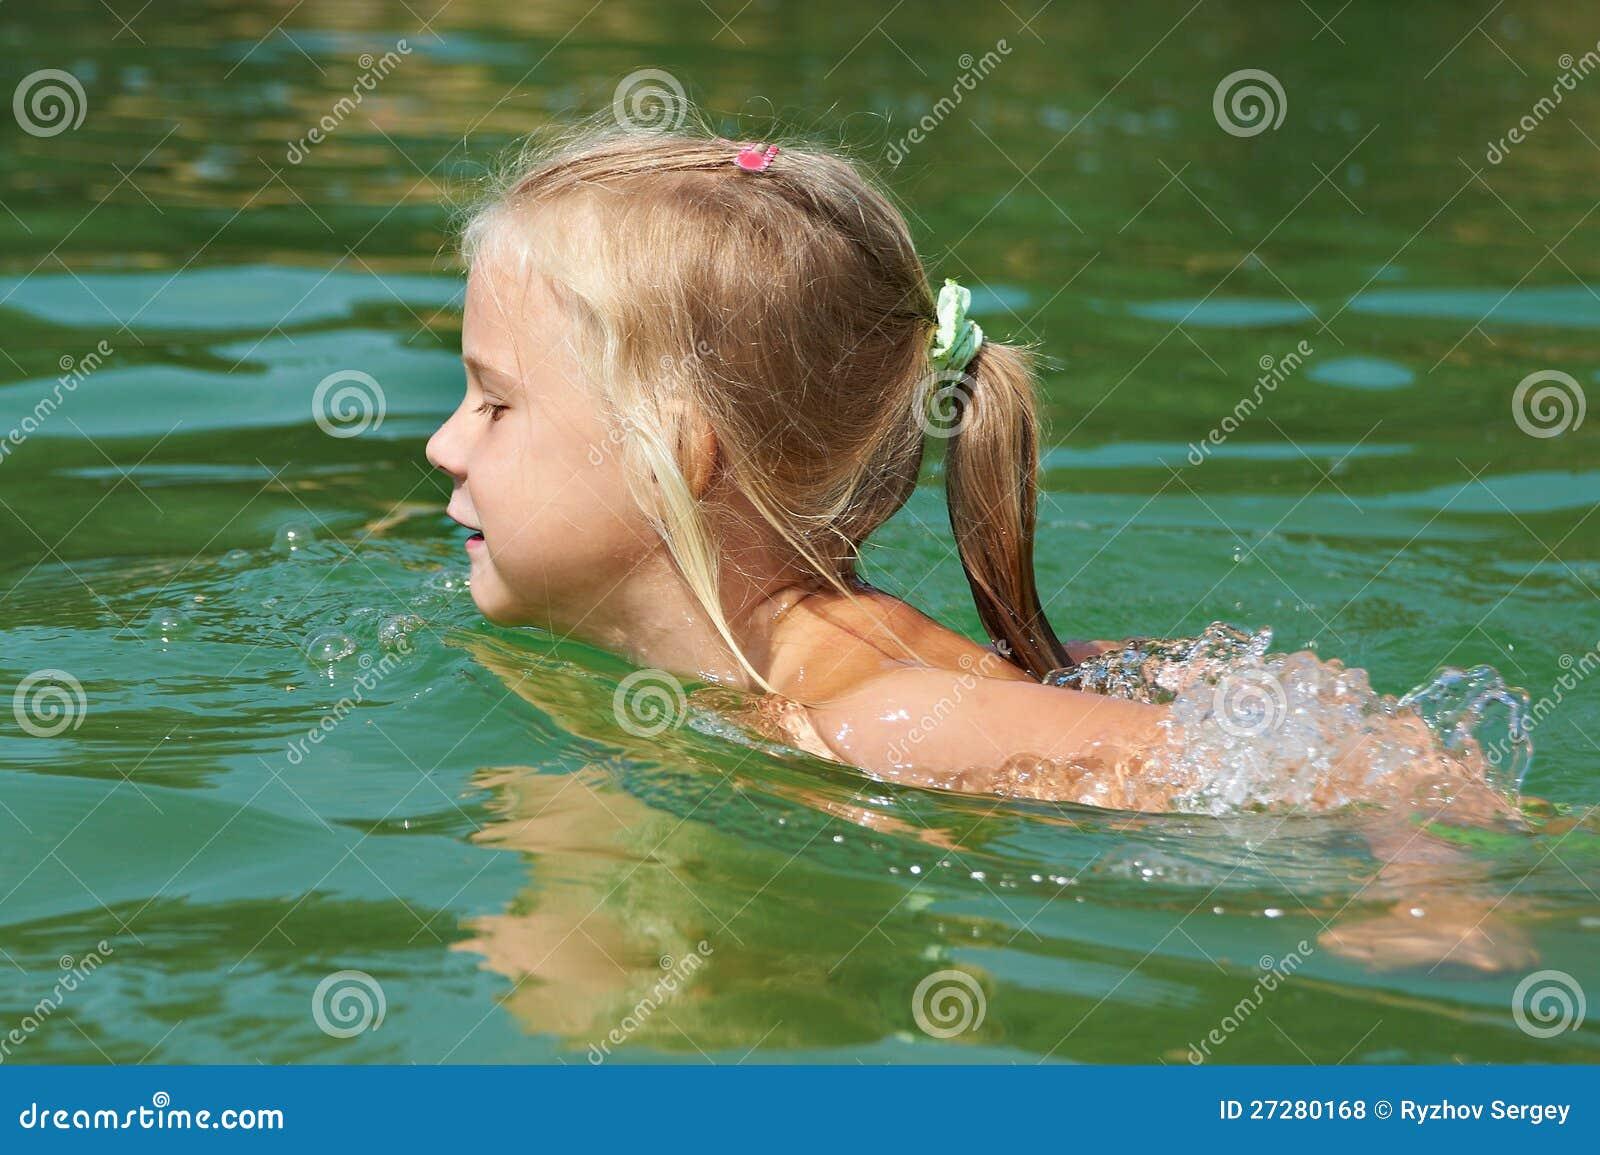 Joyful Little Girl Swimming In The Pool. Royalty Free